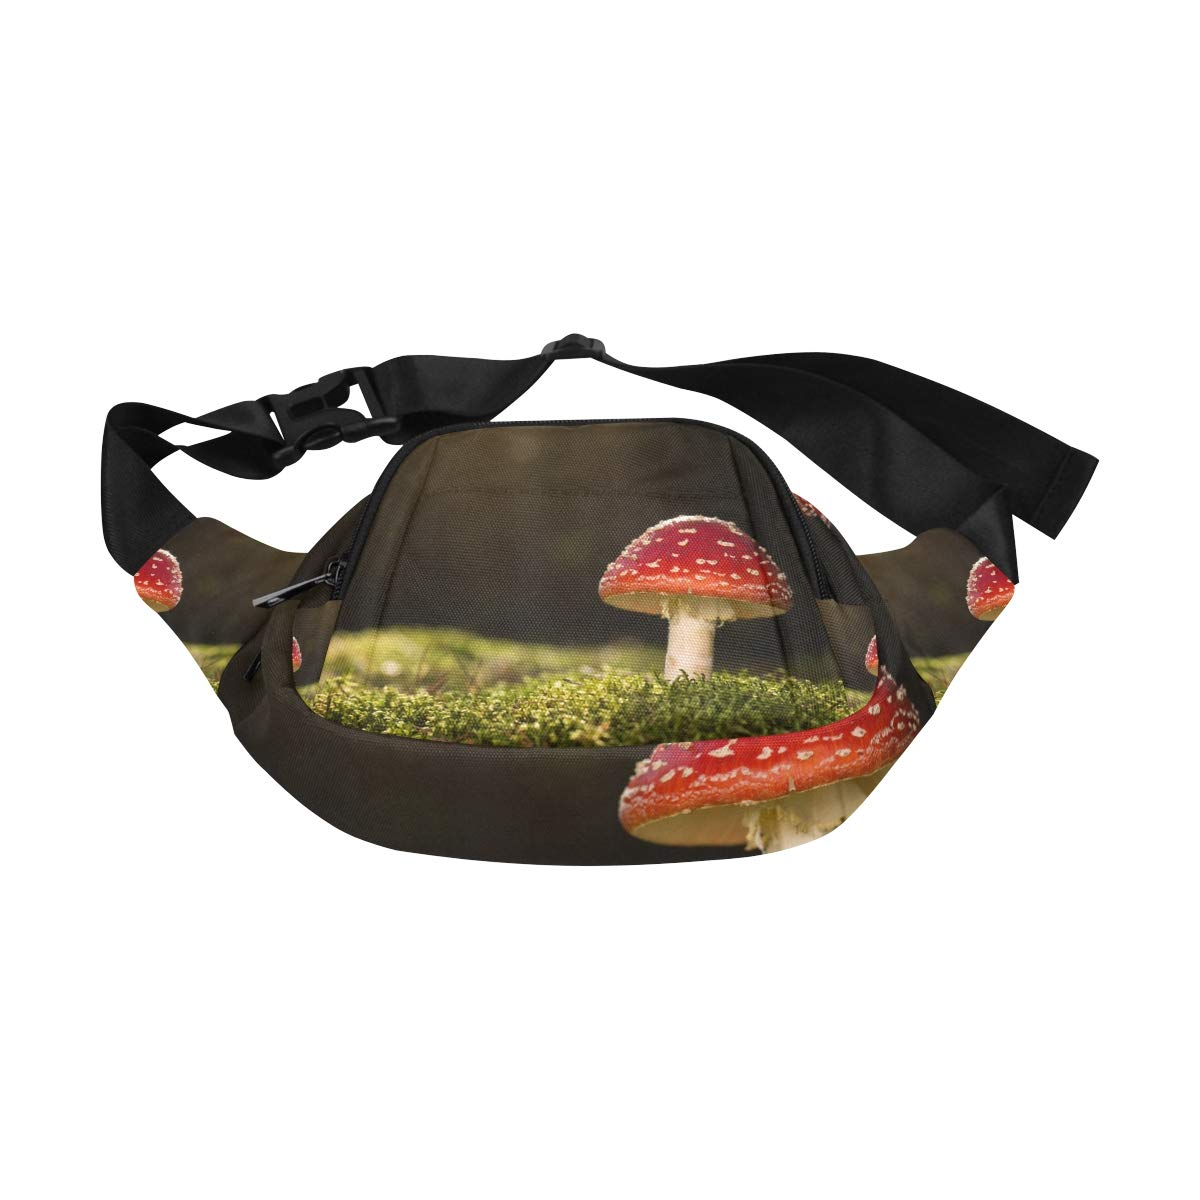 Group Of Mushrooms In The Forest Fenny Packs Waist Bags Adjustable Belt Waterproof Nylon Travel Running Sport Vacation Party For Men Women Boys Girls Kids